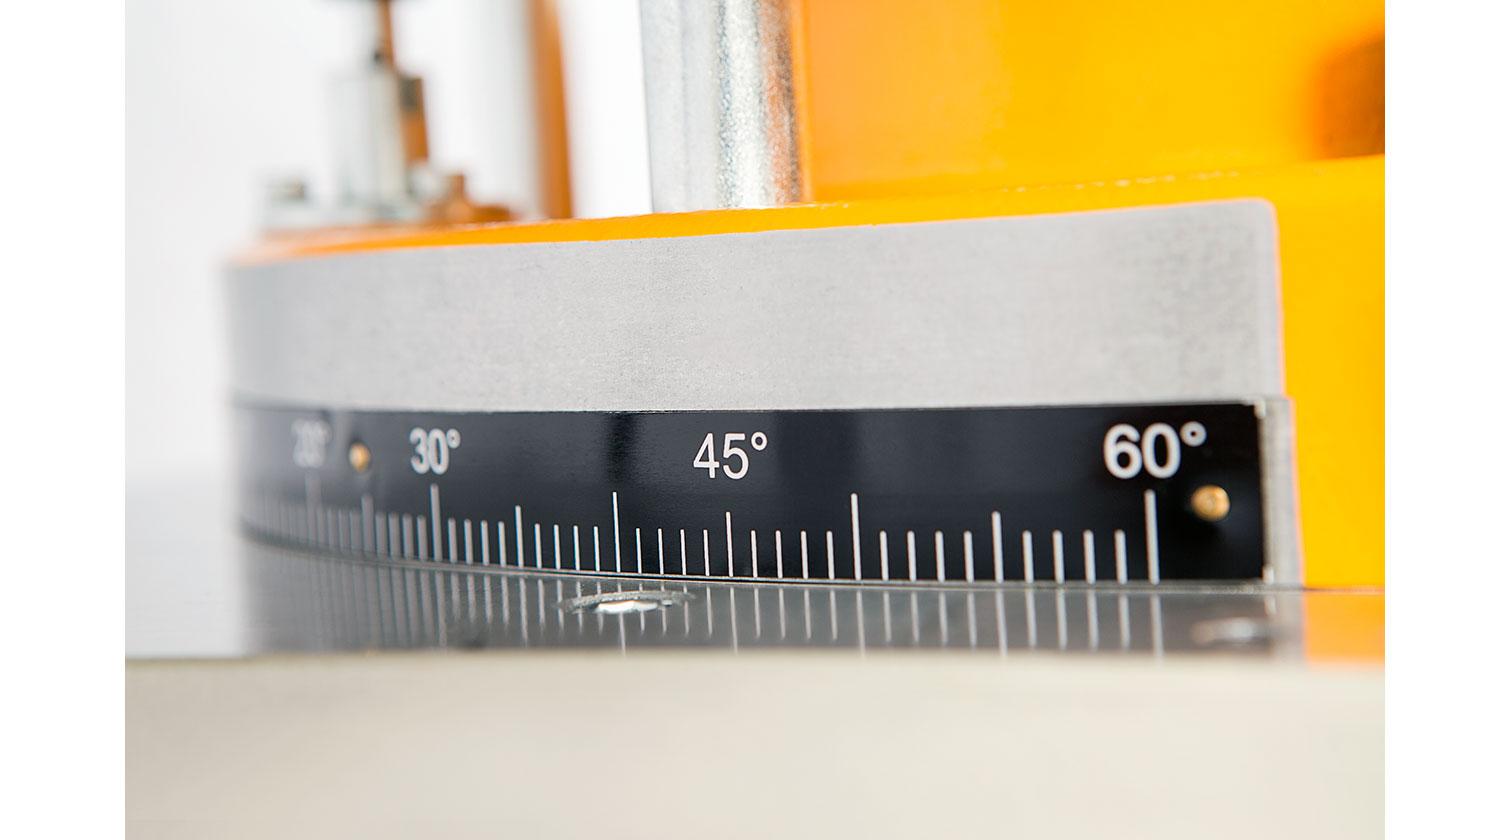 INT aluminum manual up cut saw Yilmaz MK 420 angle adjustment